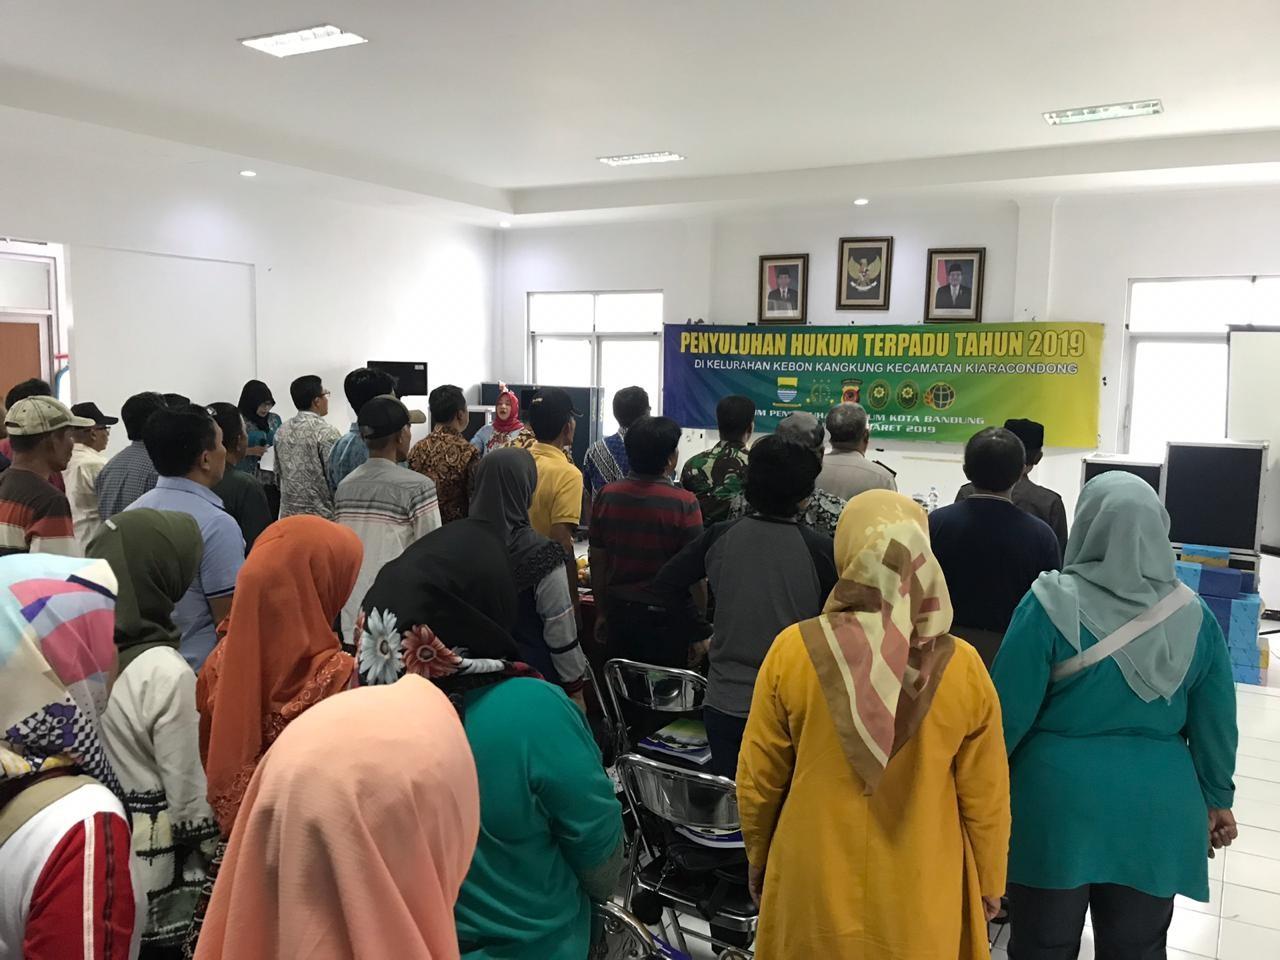 Preview PENYULUHAN HUKUM TERPADU PADA WARGA KELURAHAN KEBON KANGKUNG, KOTA BANDUNG, 15 MARET 2019